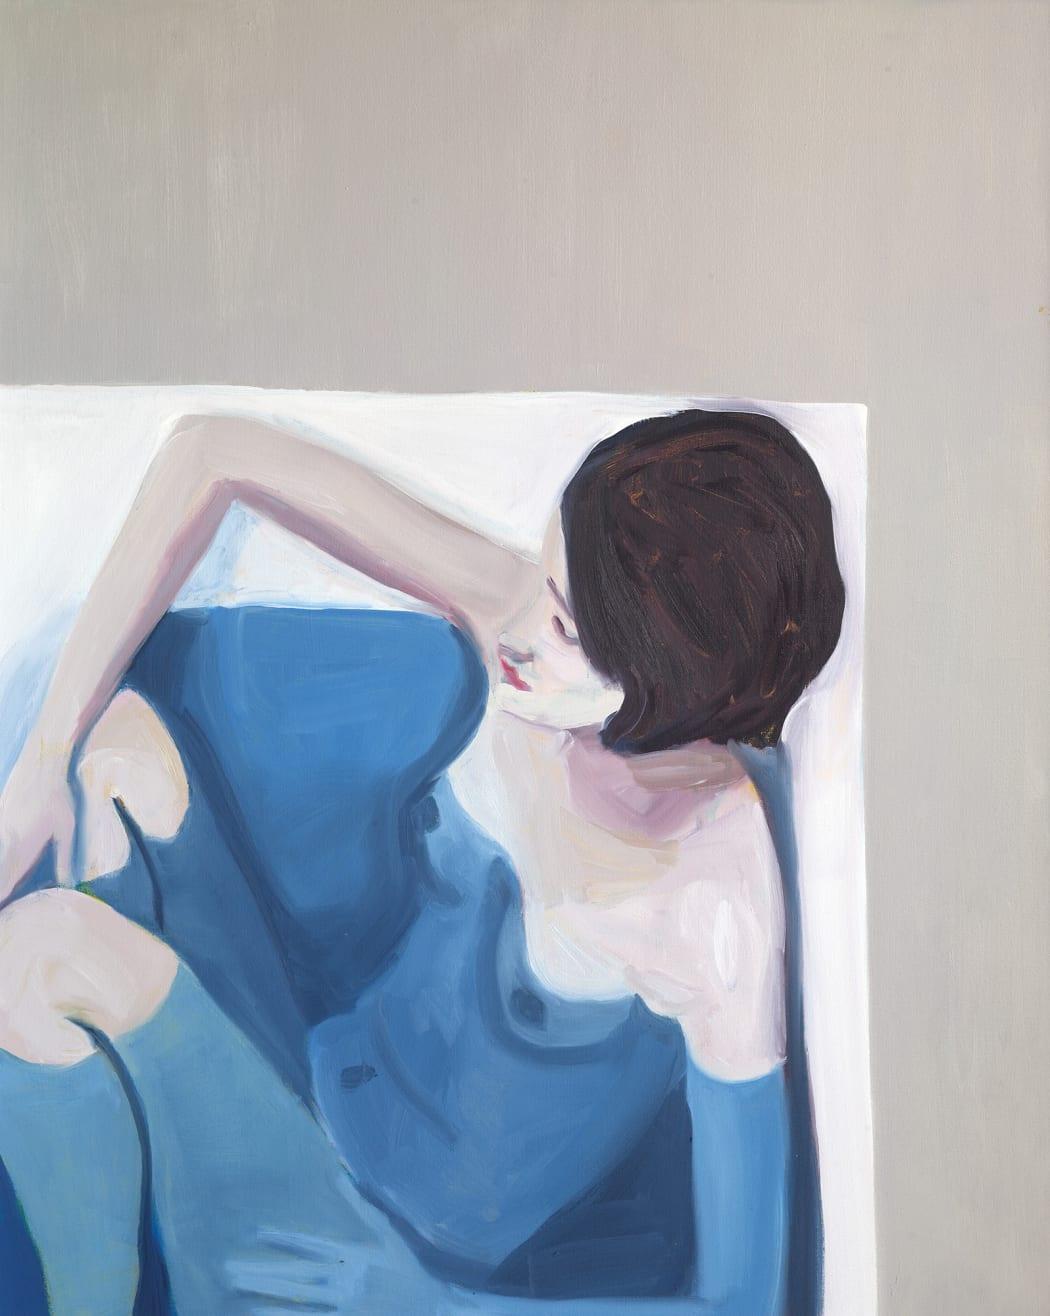 SPOTLIGHT | Shelley Adler: Taking a Bath (Lee Miller)